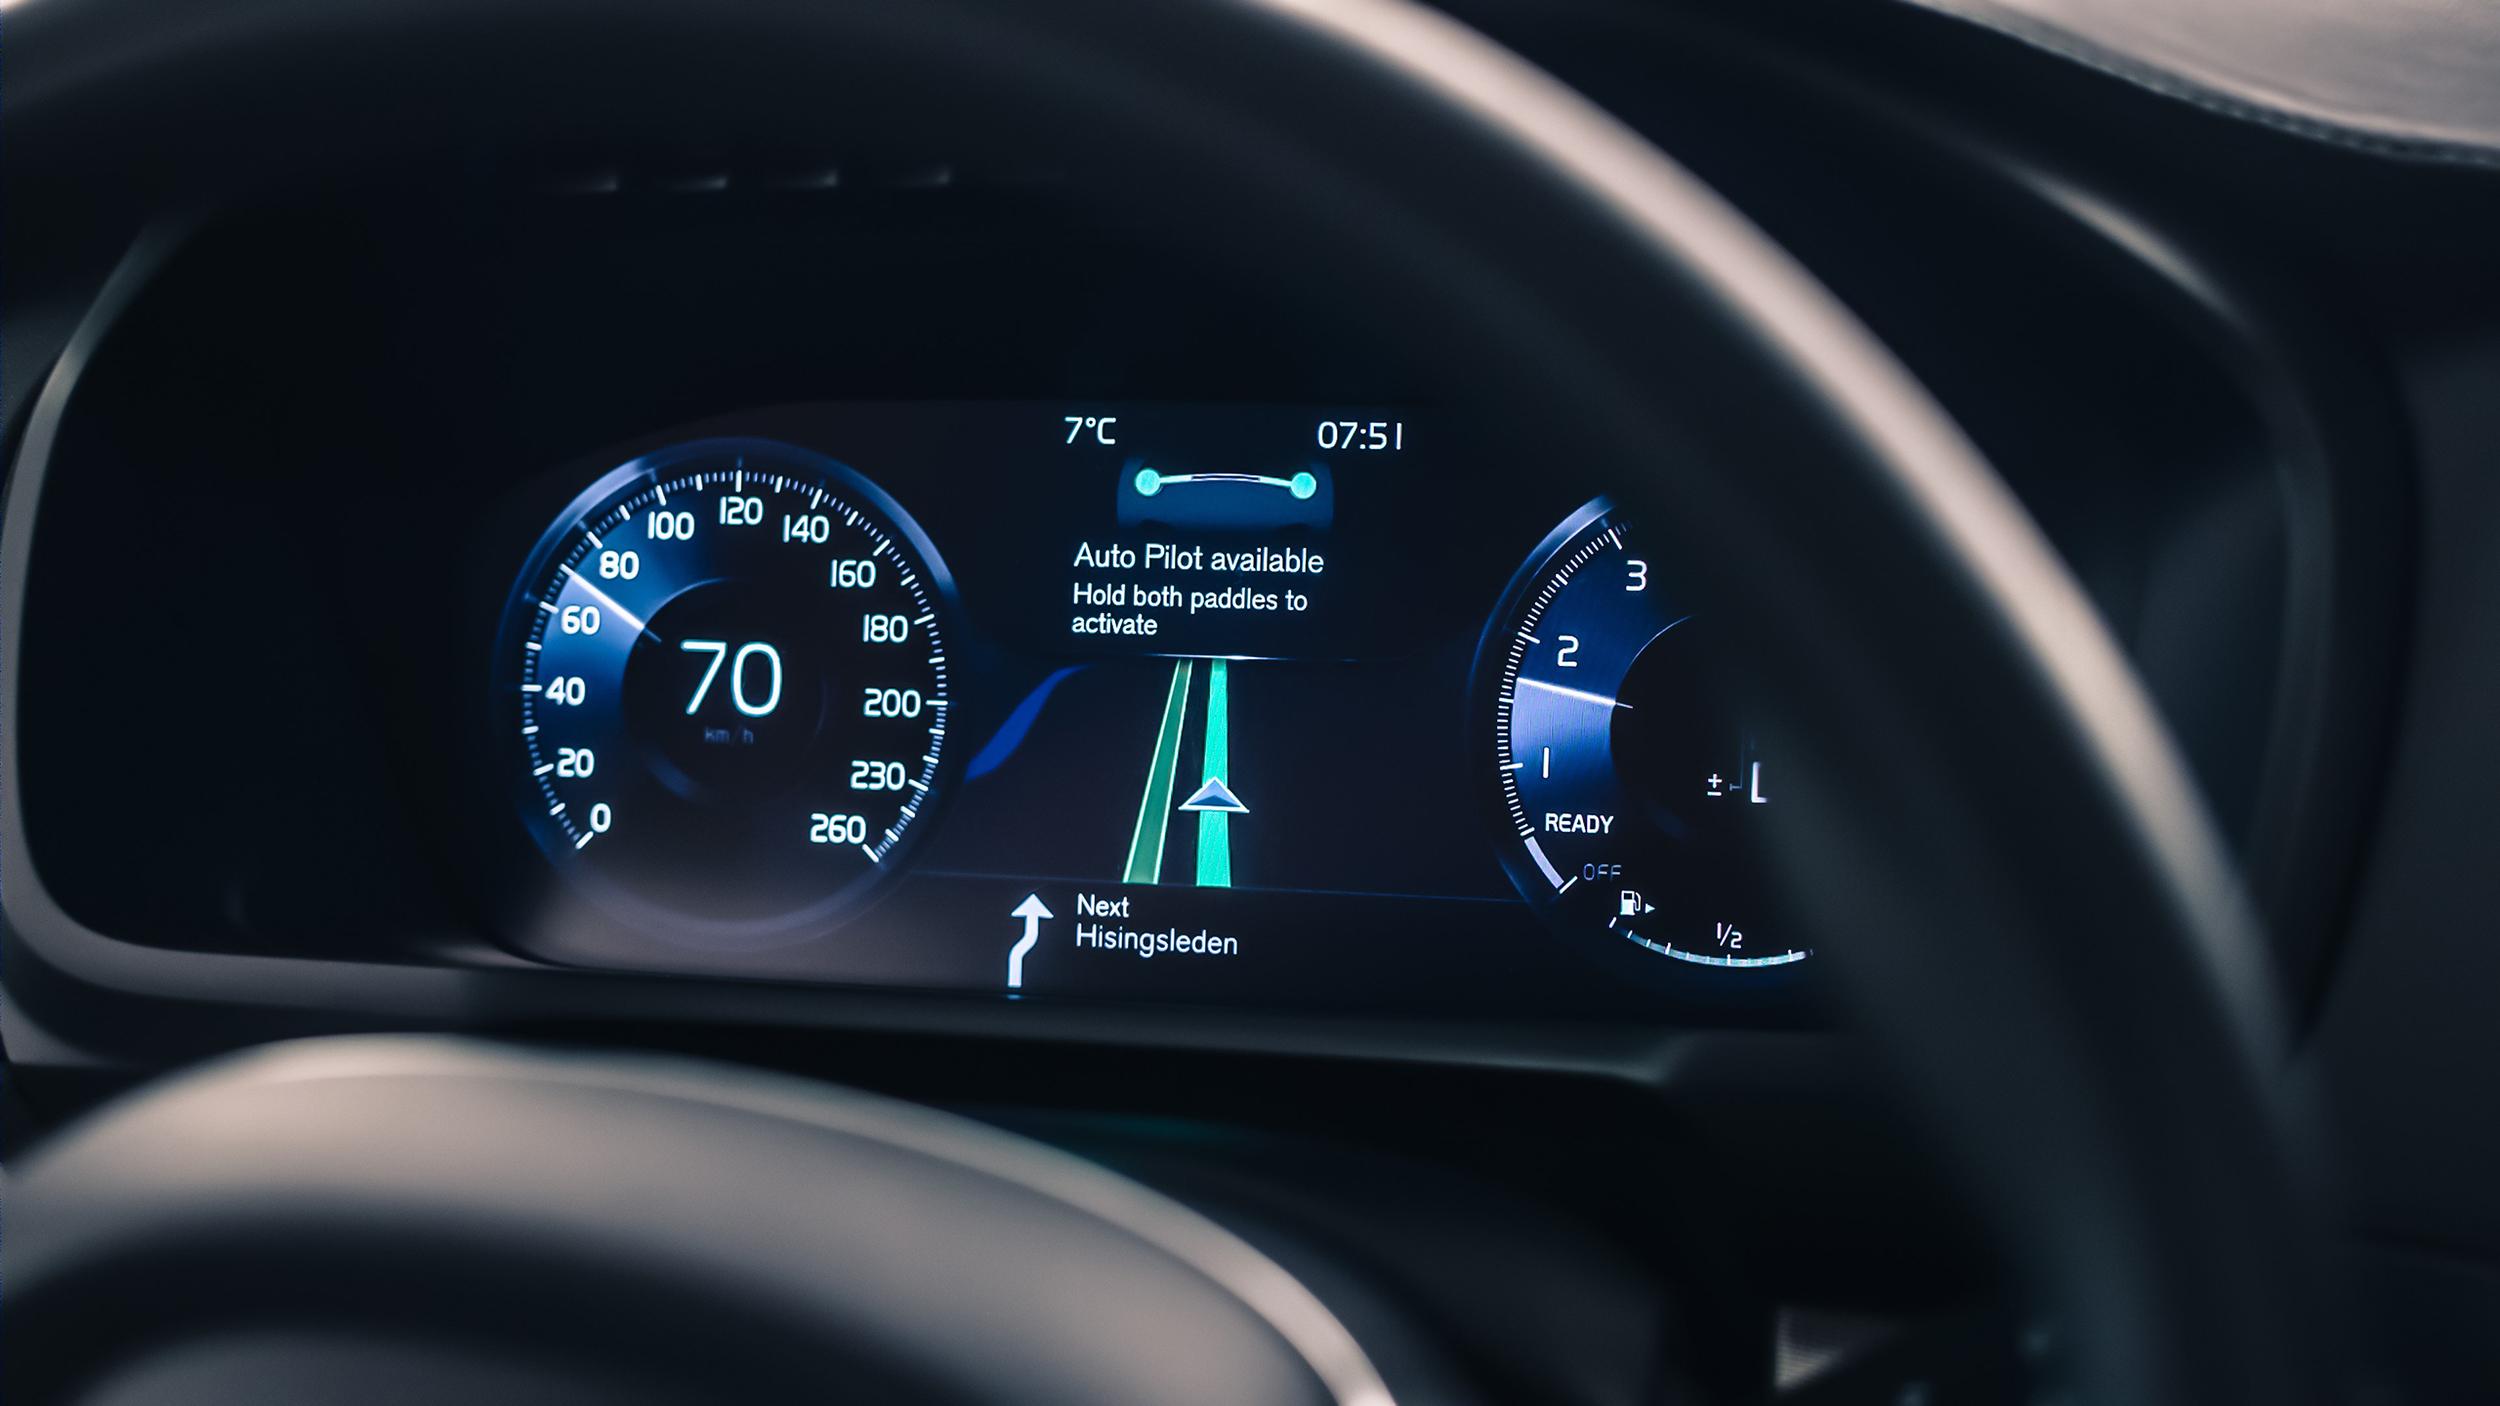 167926_IntelliSafe_Auto_Pilot_interface.jpg